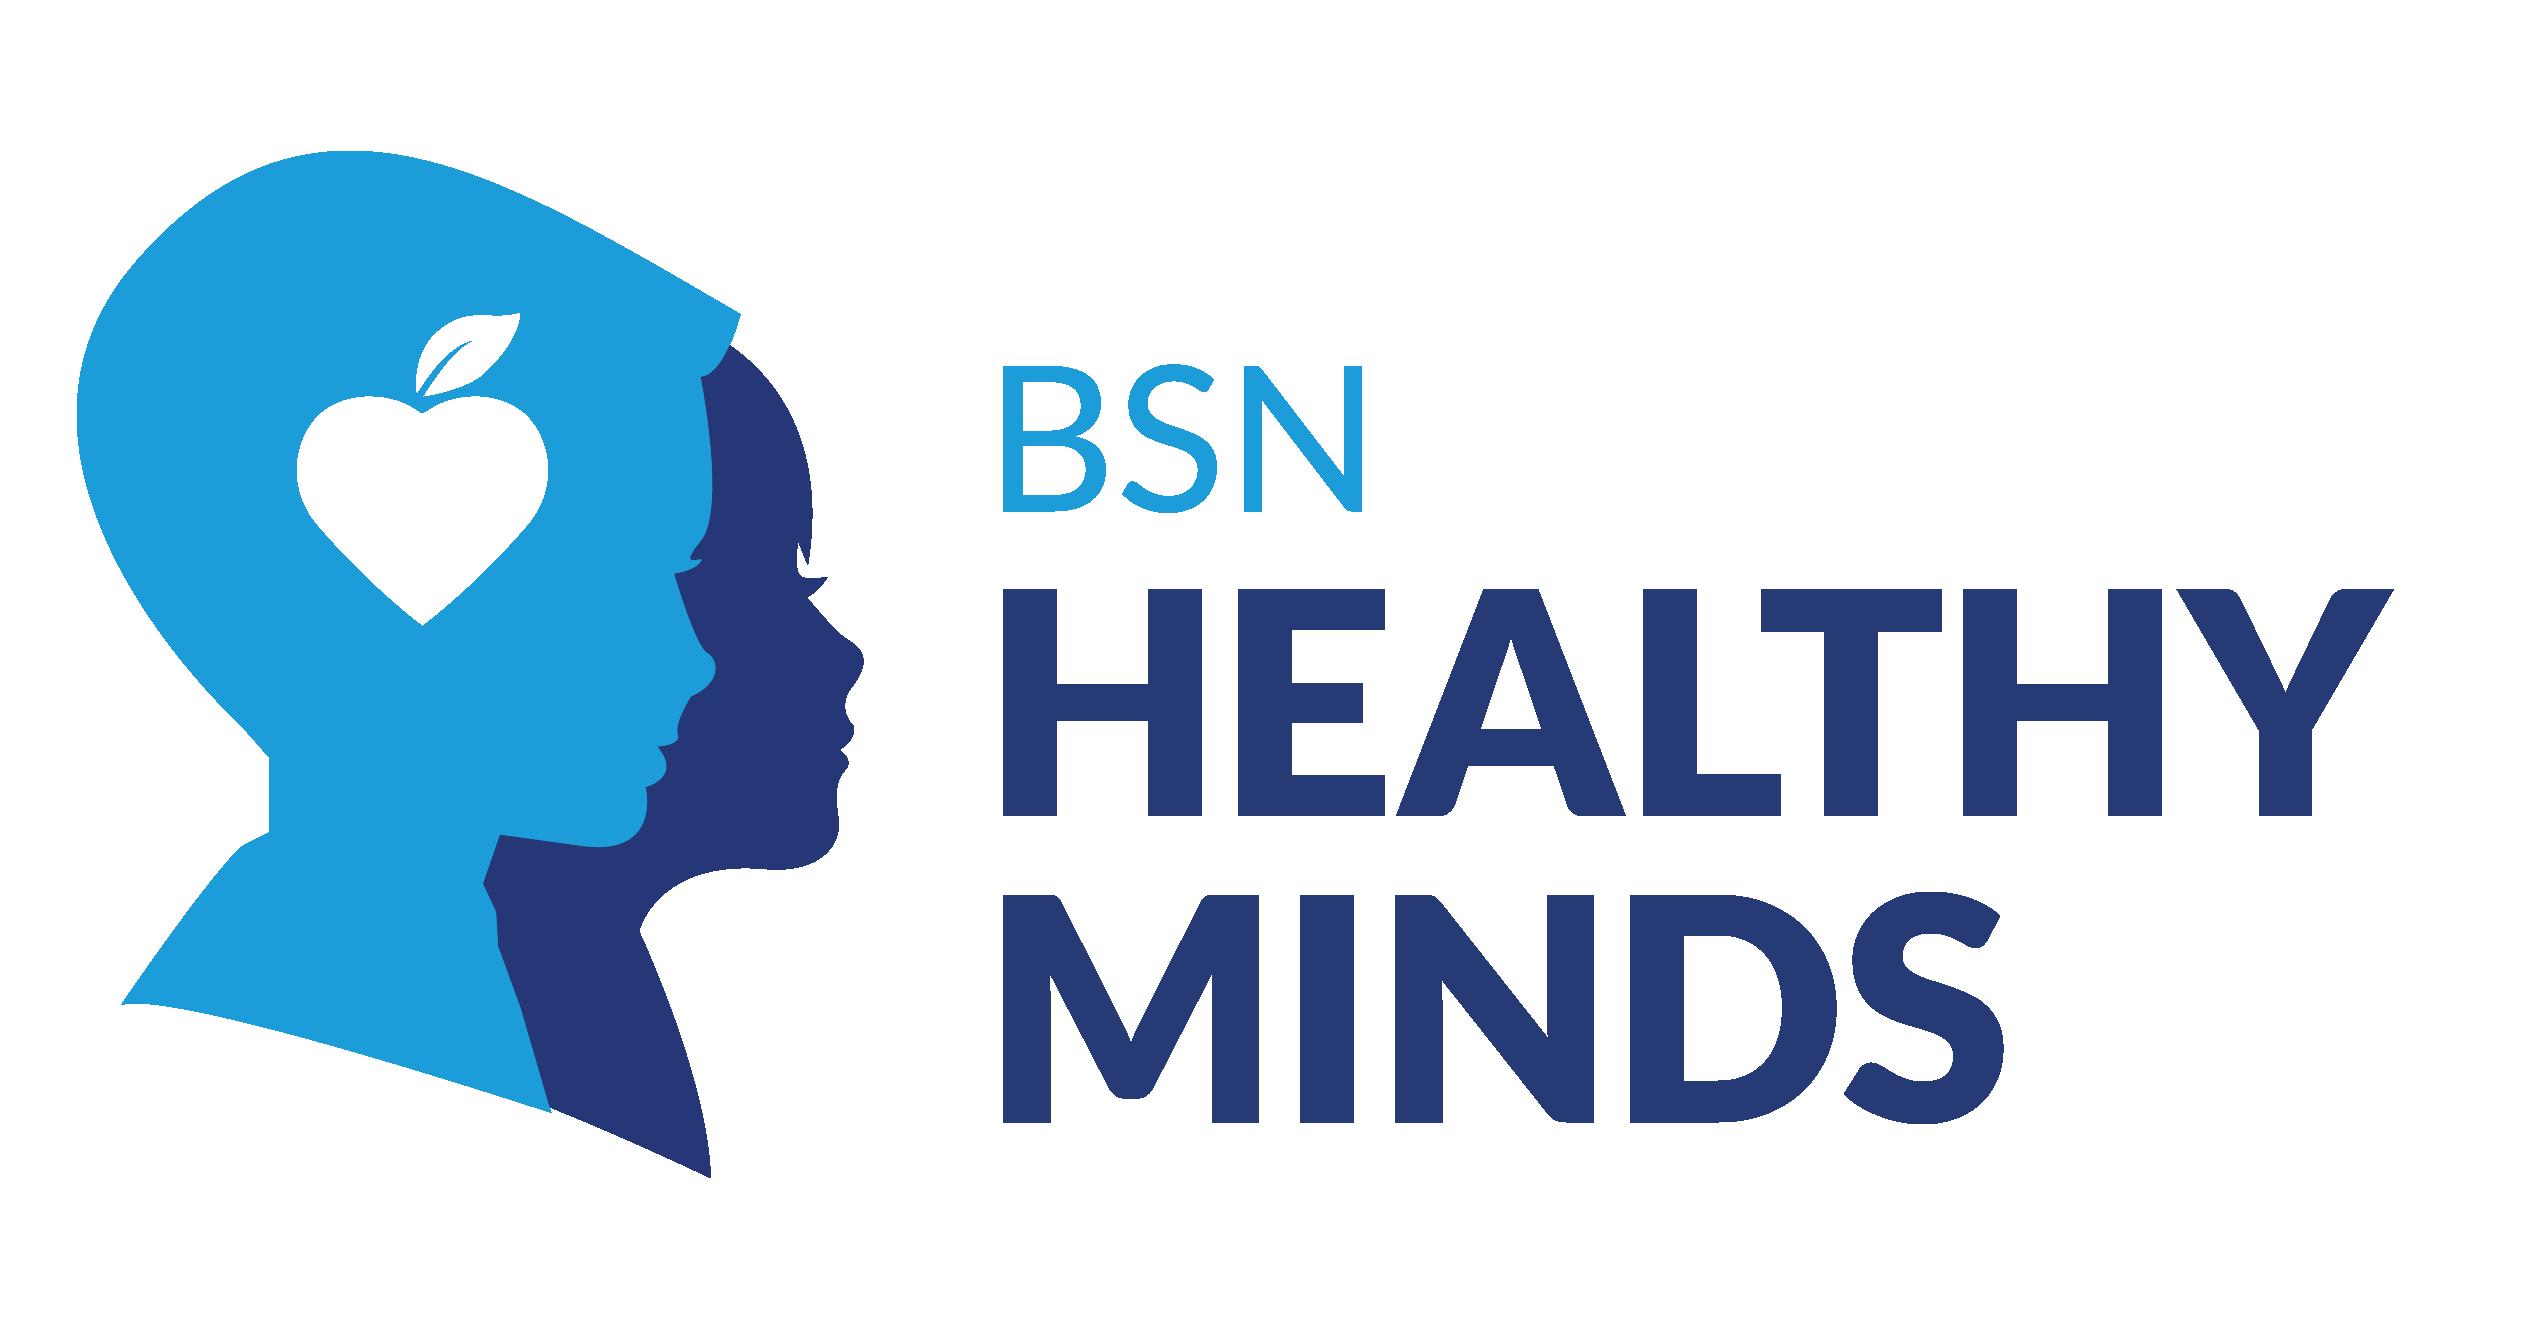 BSN Healthy Minds